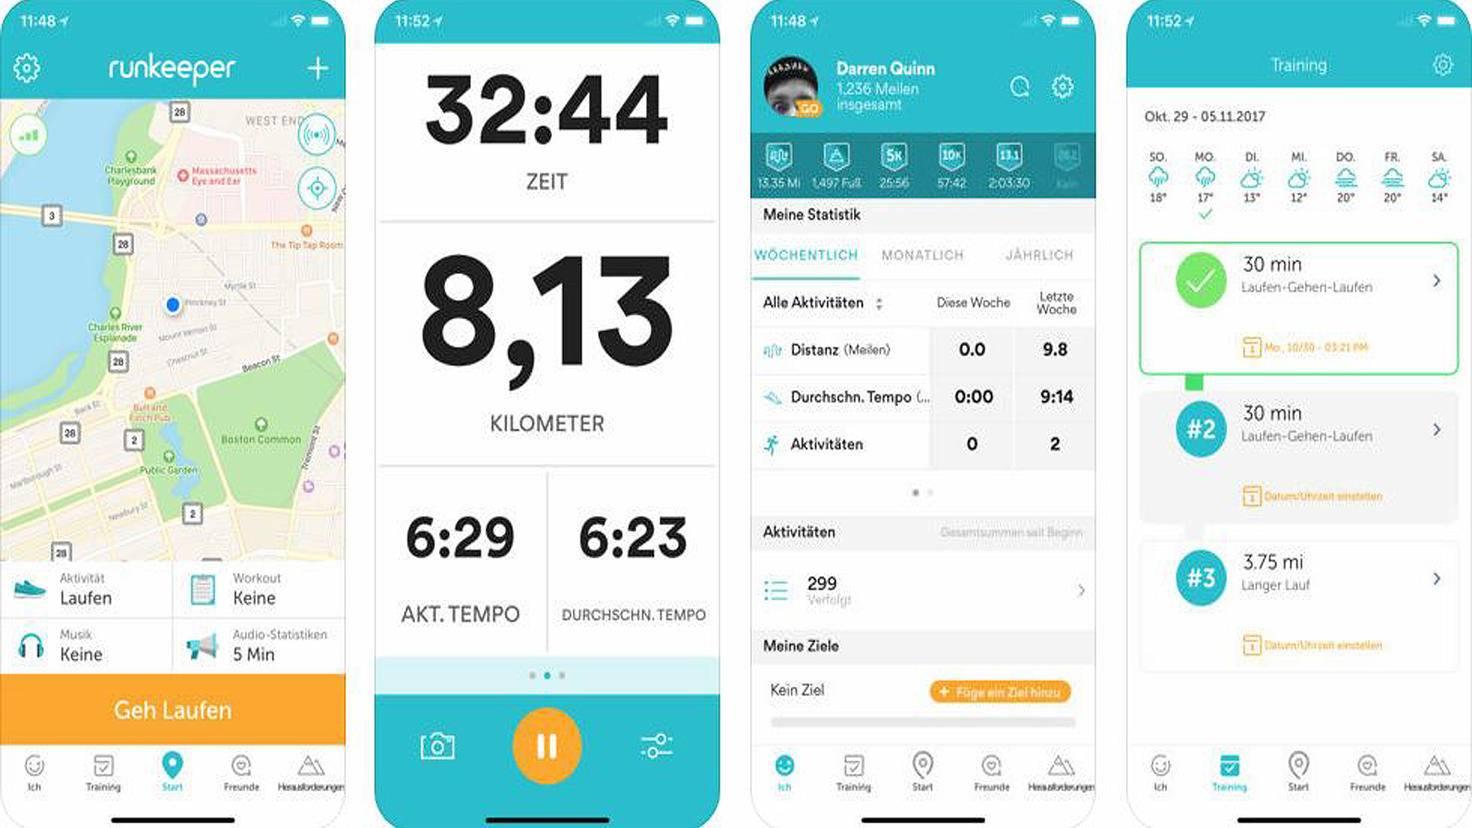 Runkeeper-iTunes-FitnessKeeper Inc